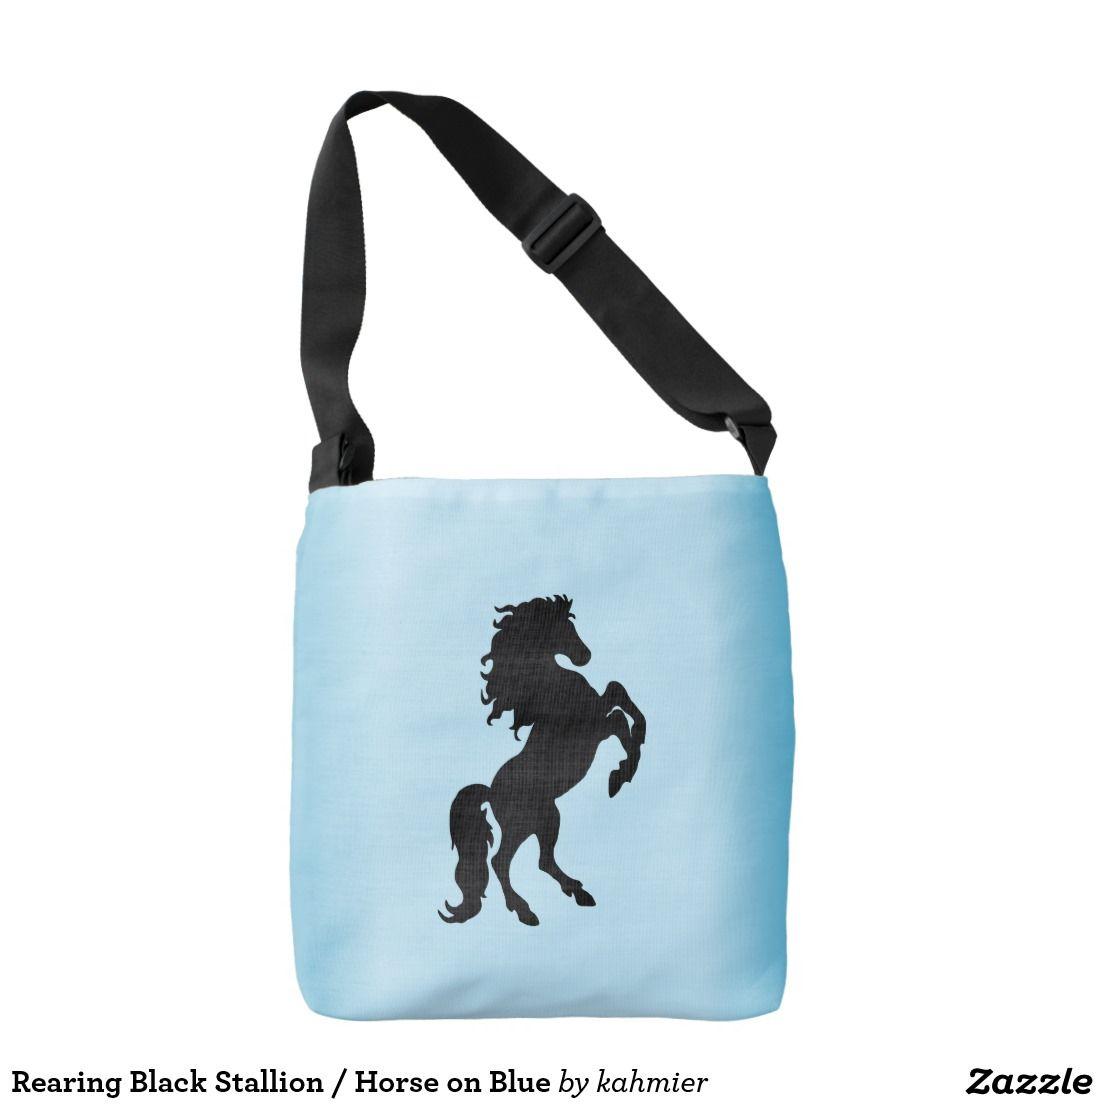 Rearing Black Stallion / Horse on Blue Crossbody Bag #equine 40% off tote bags #zazzle www.leatherwooddesign.com  #sale